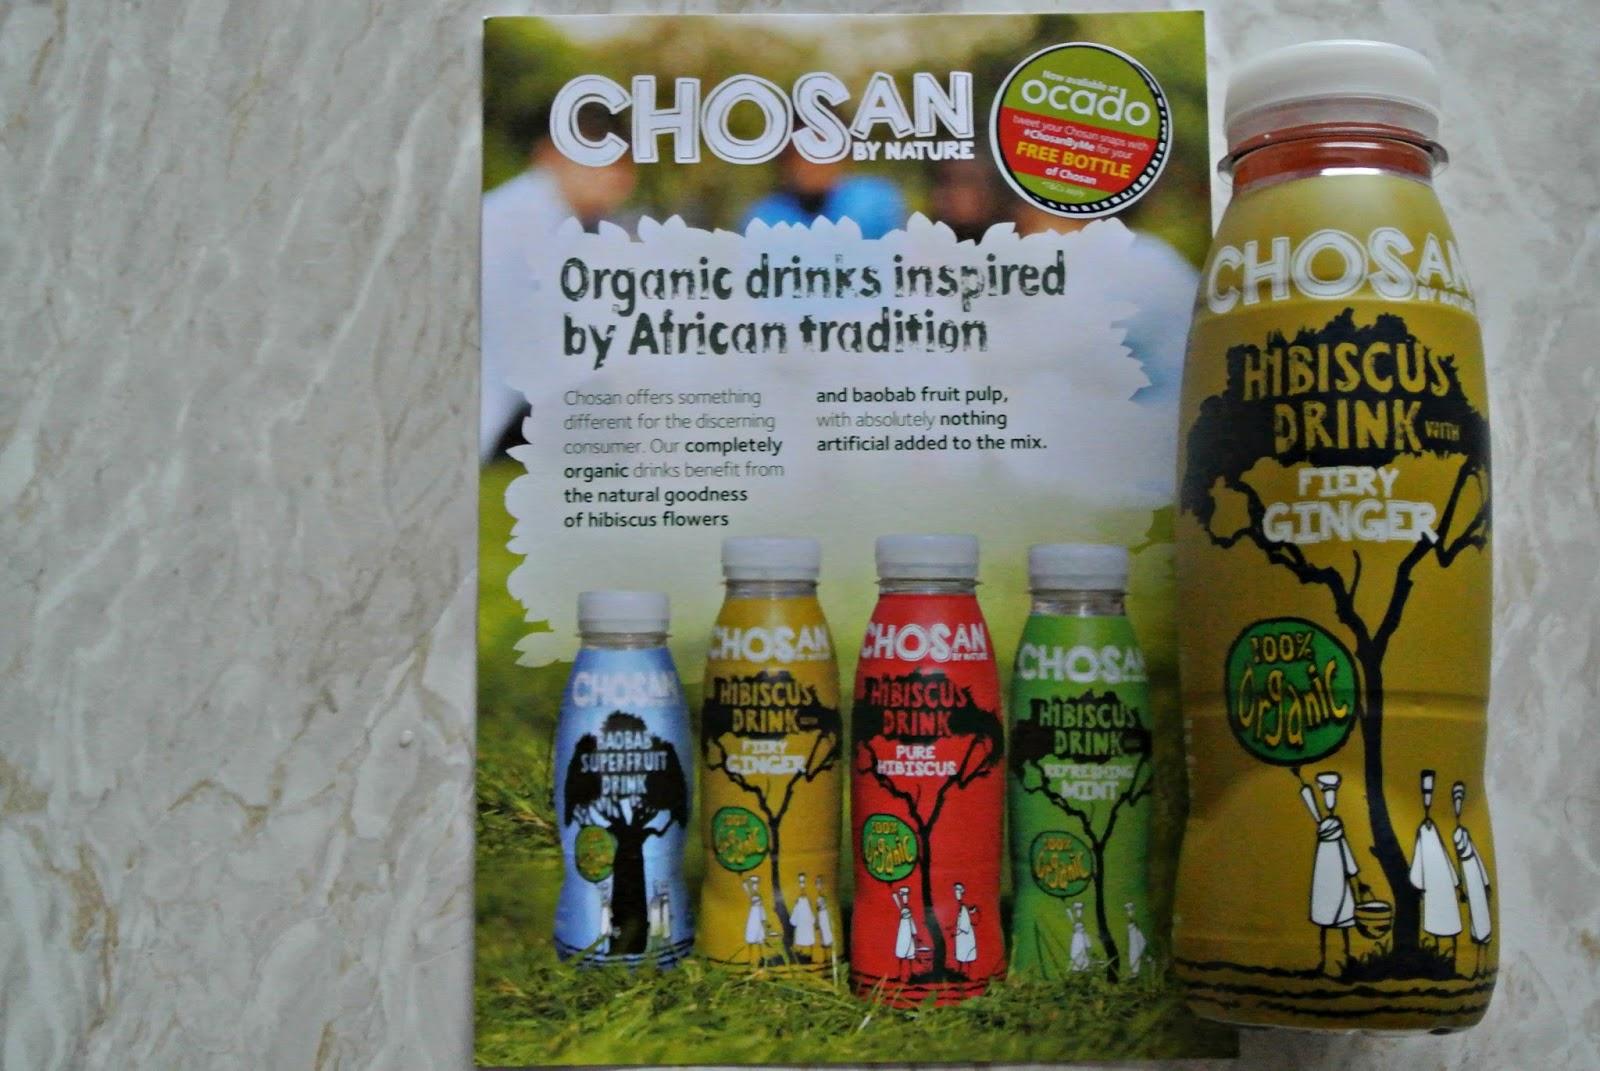 Chosan Hibiscus Drink with Fiery Ginger Degustabox